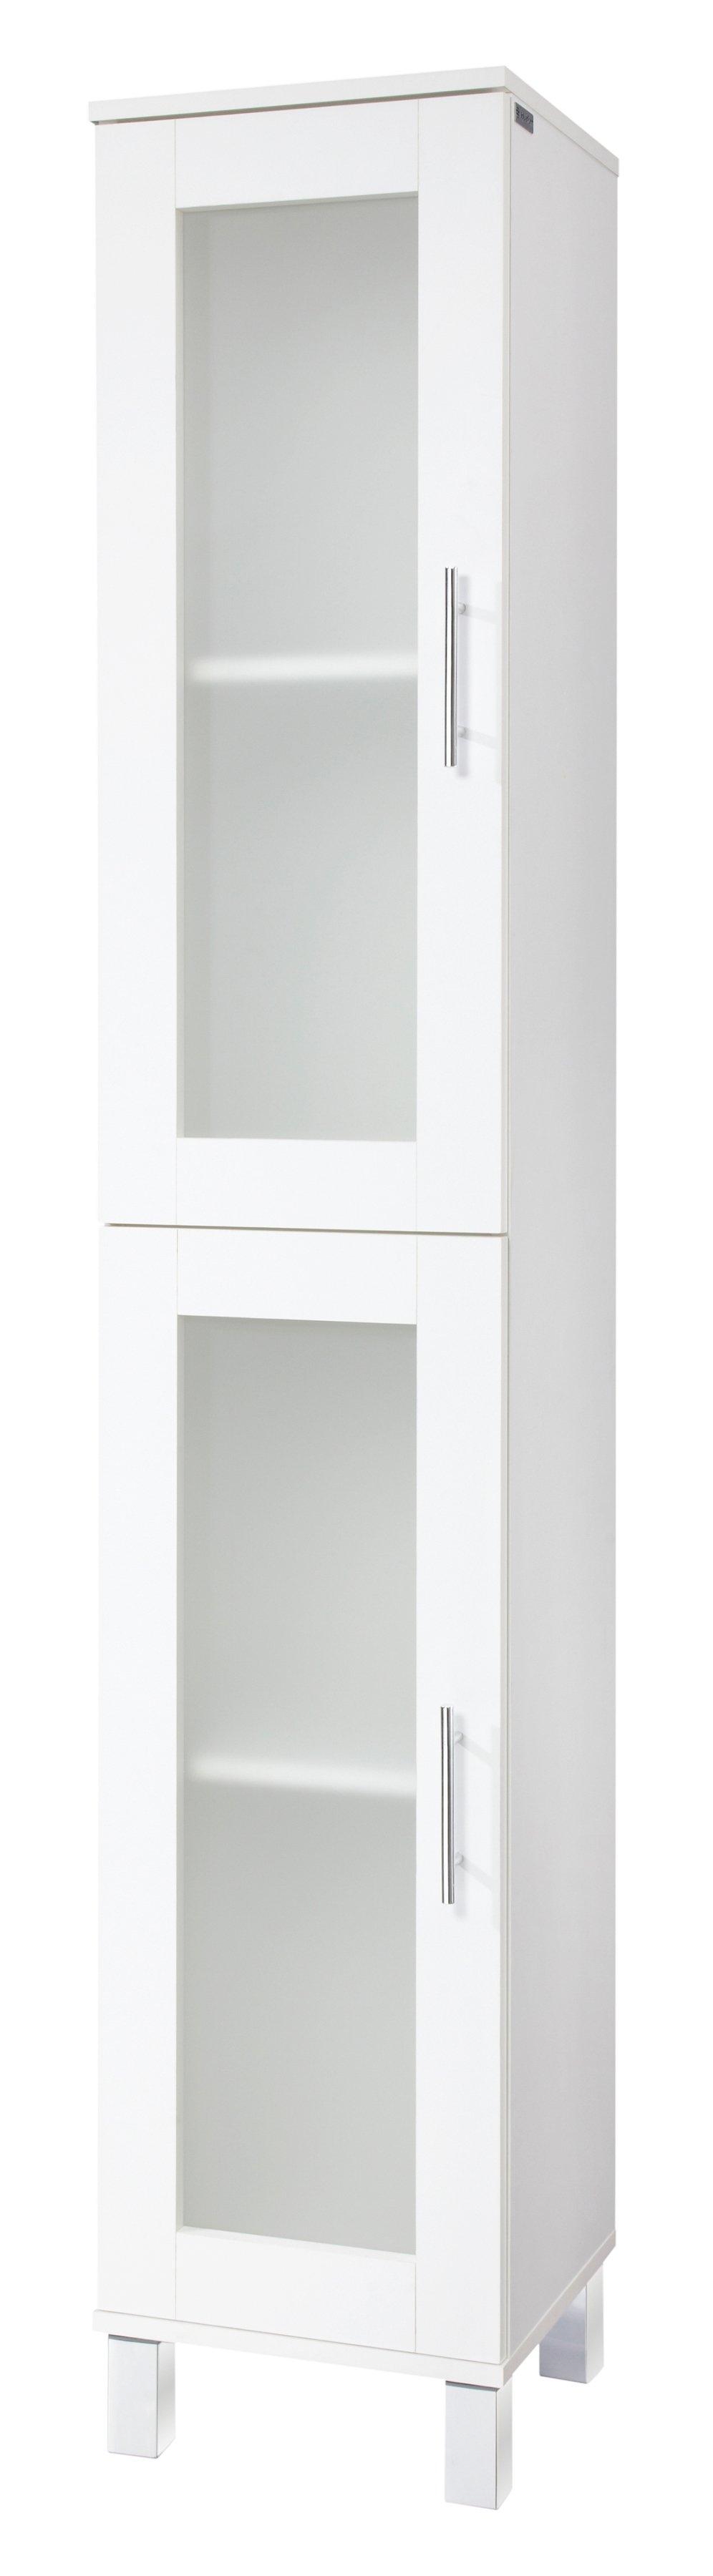 Aquaform Hoge kast »Helsinki«, Breedte 35 cm - gratis ruilen op otto.nl